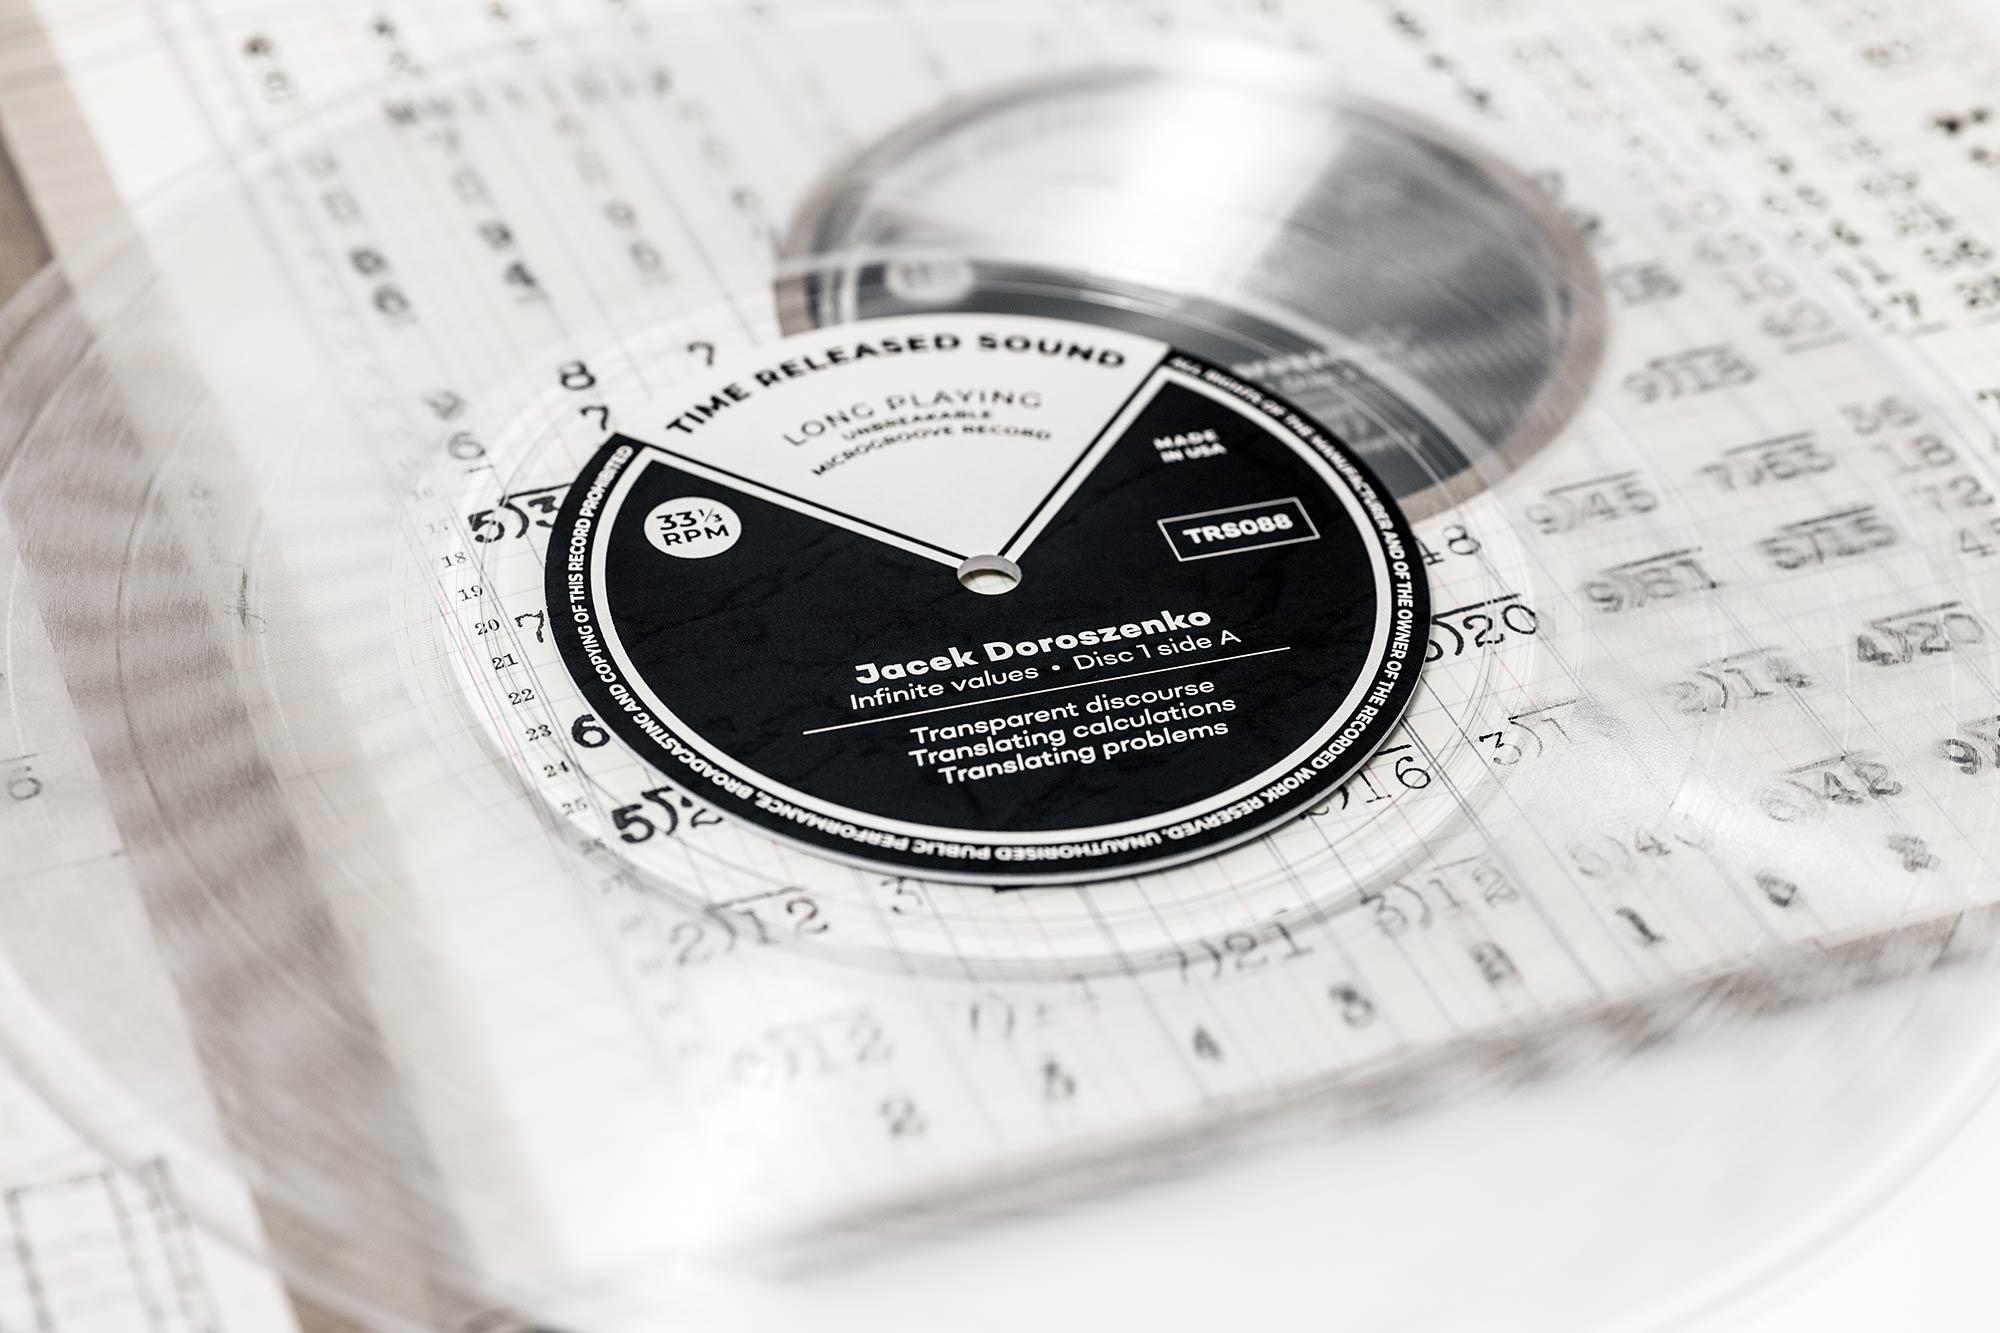 Jacek Doroszenko - Infinite Values, contemporary music album 06